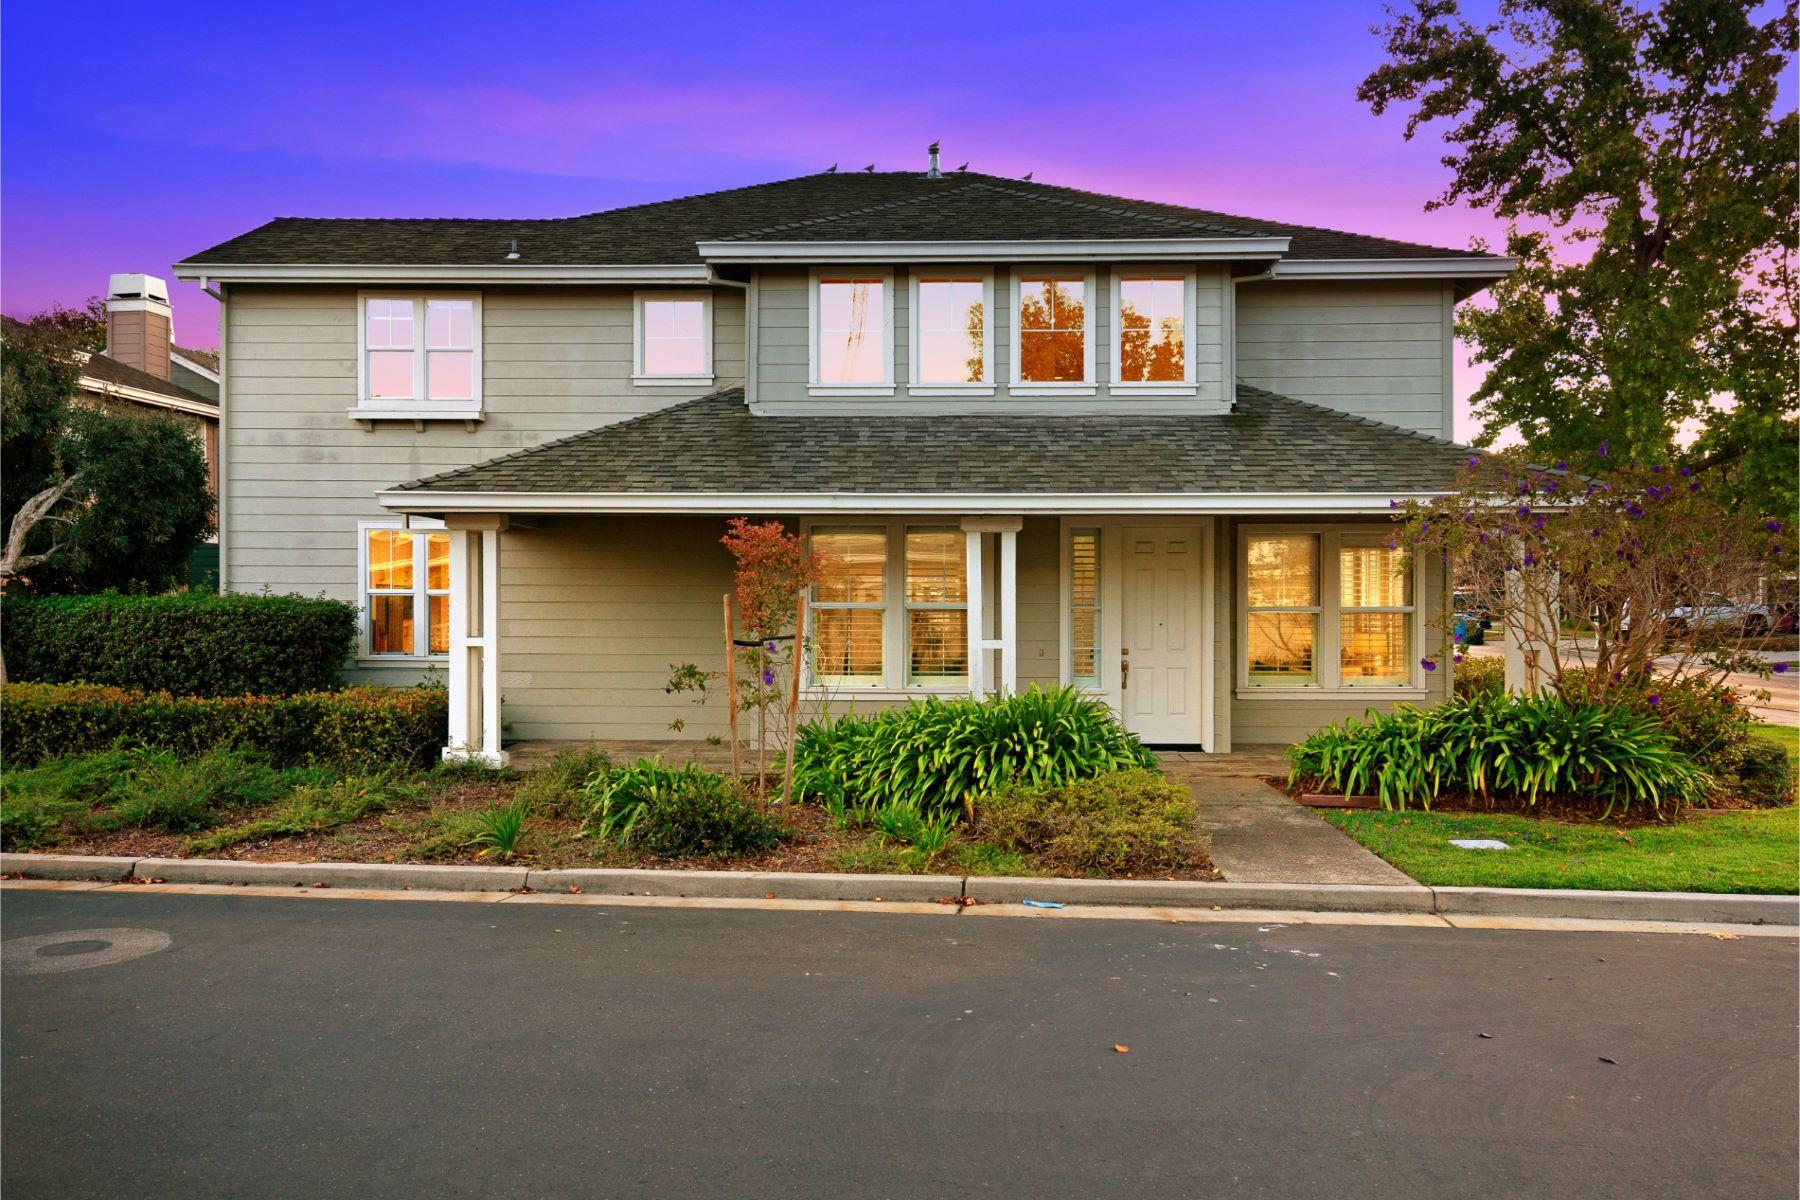 Single Family Home for Active at Fabulous Gossamer Hollow Home 300 Sandhurst Street Redwood City, California 94065 United States